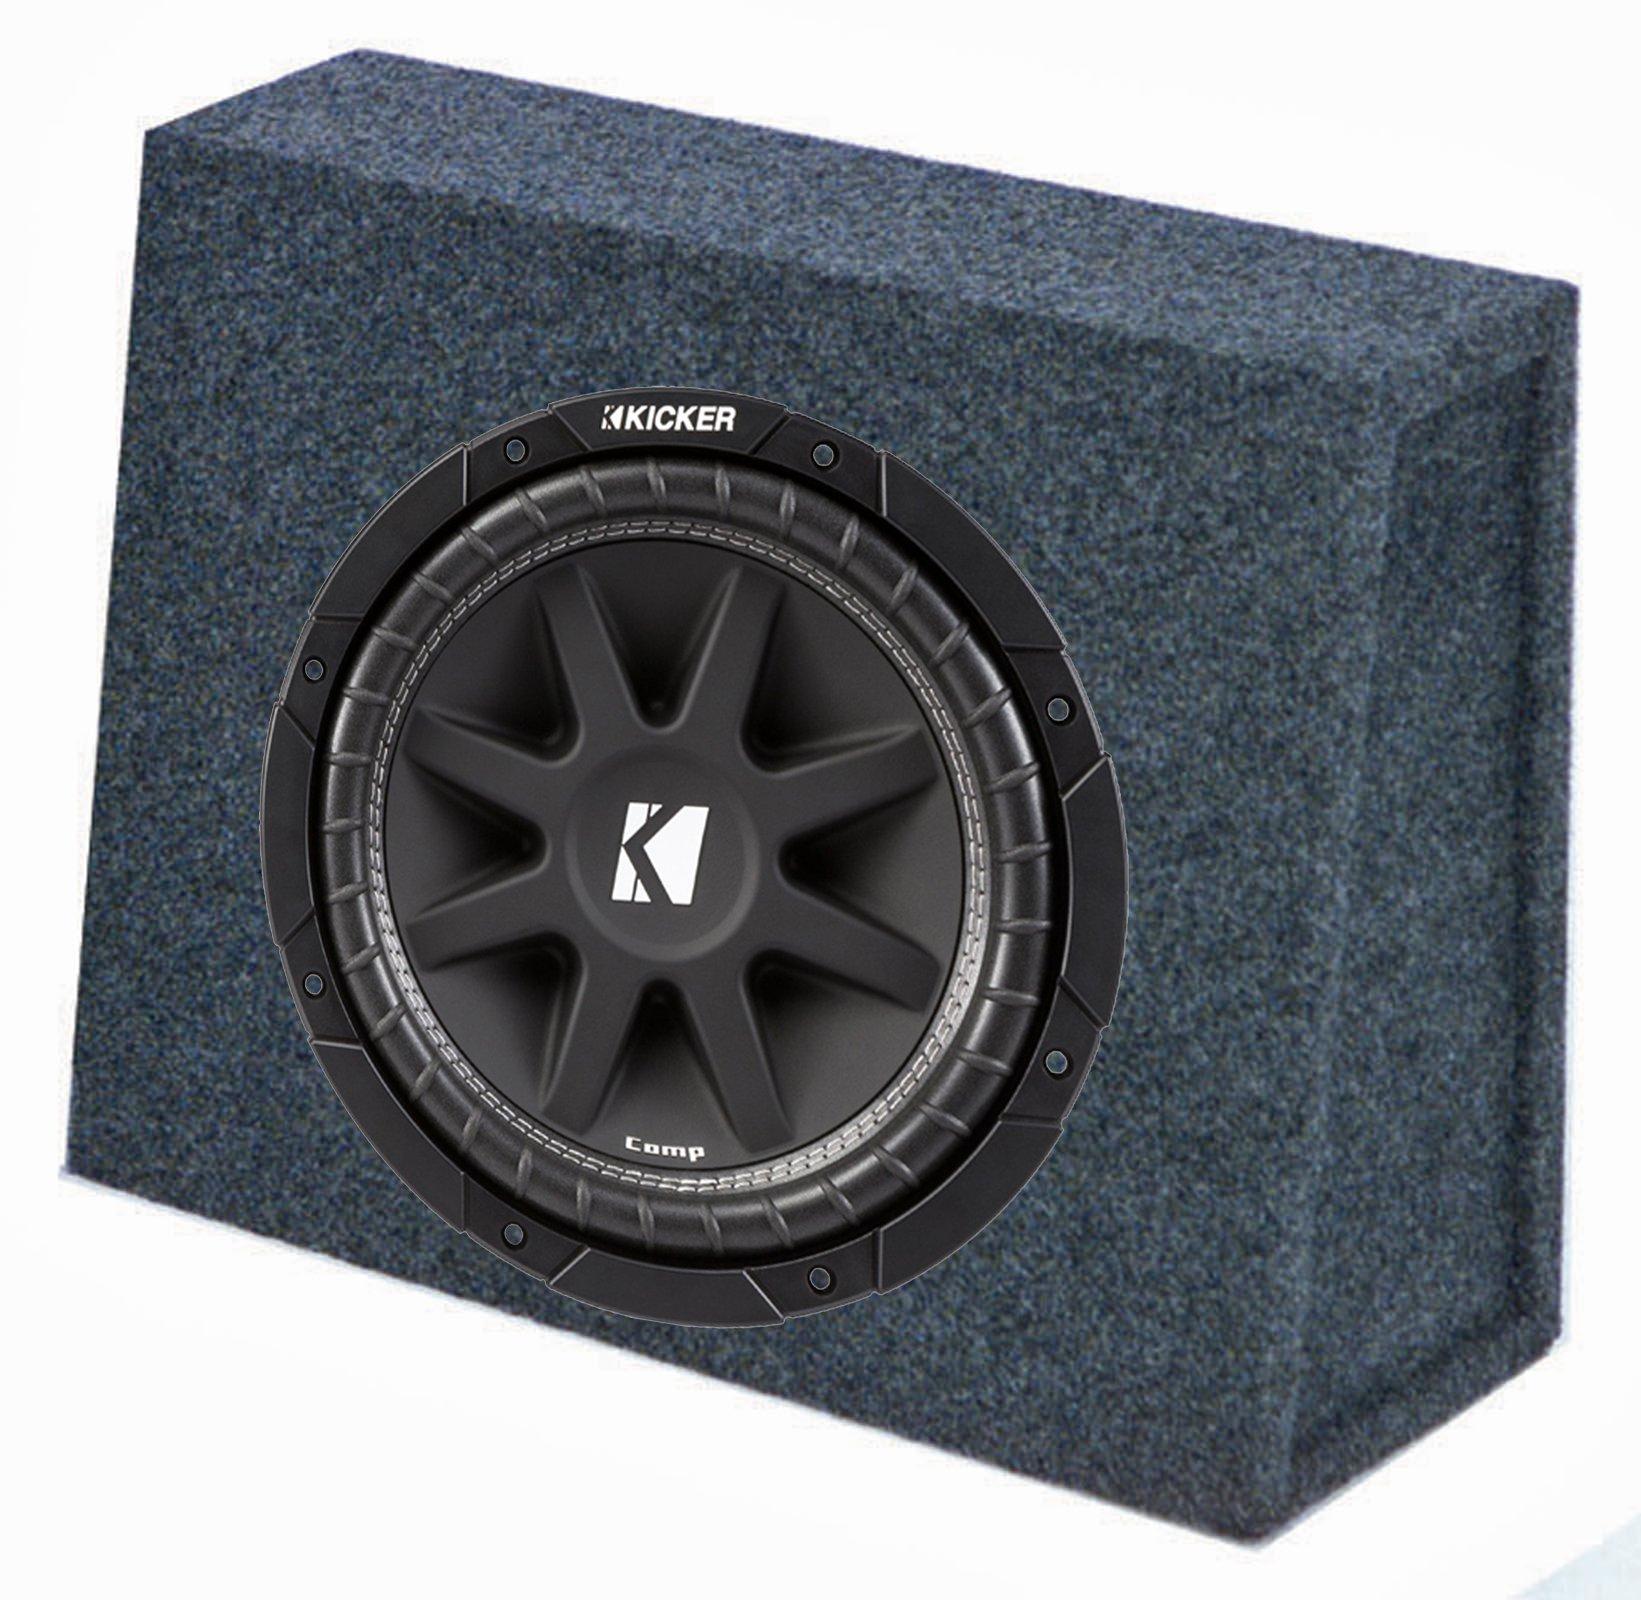 "Kicker 10C104 10"" 300W 4-Ohm Car Audio Subwoofer Sub + Slim Shallow Truck"